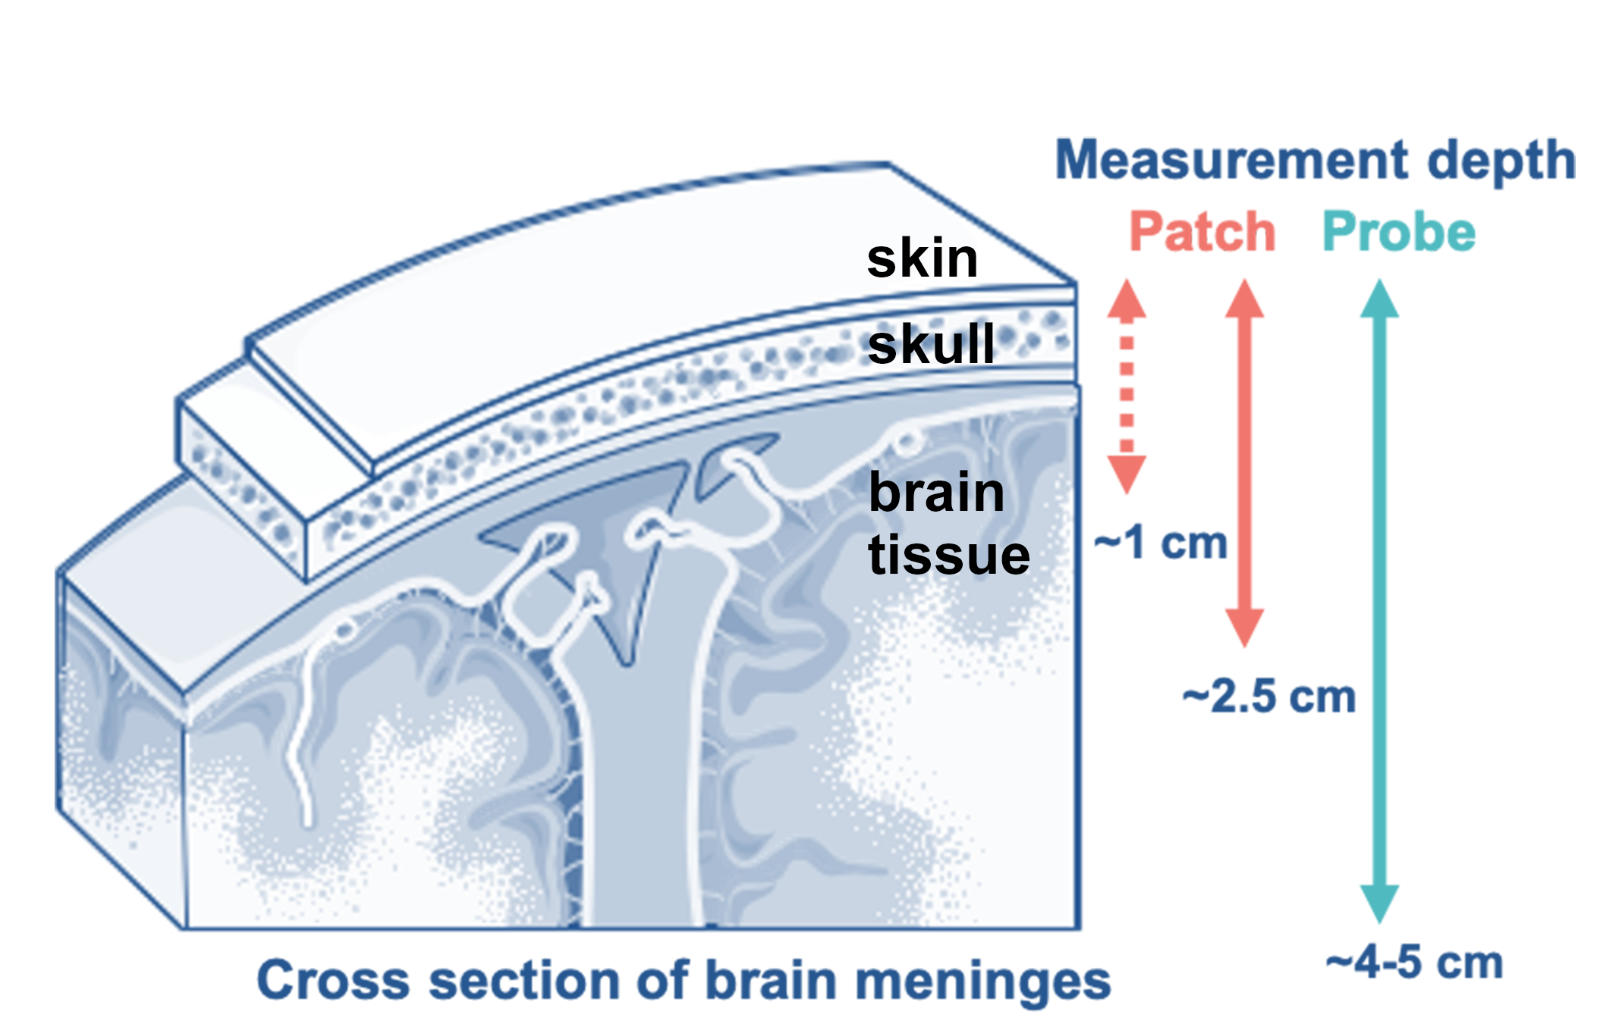 Measurement depth